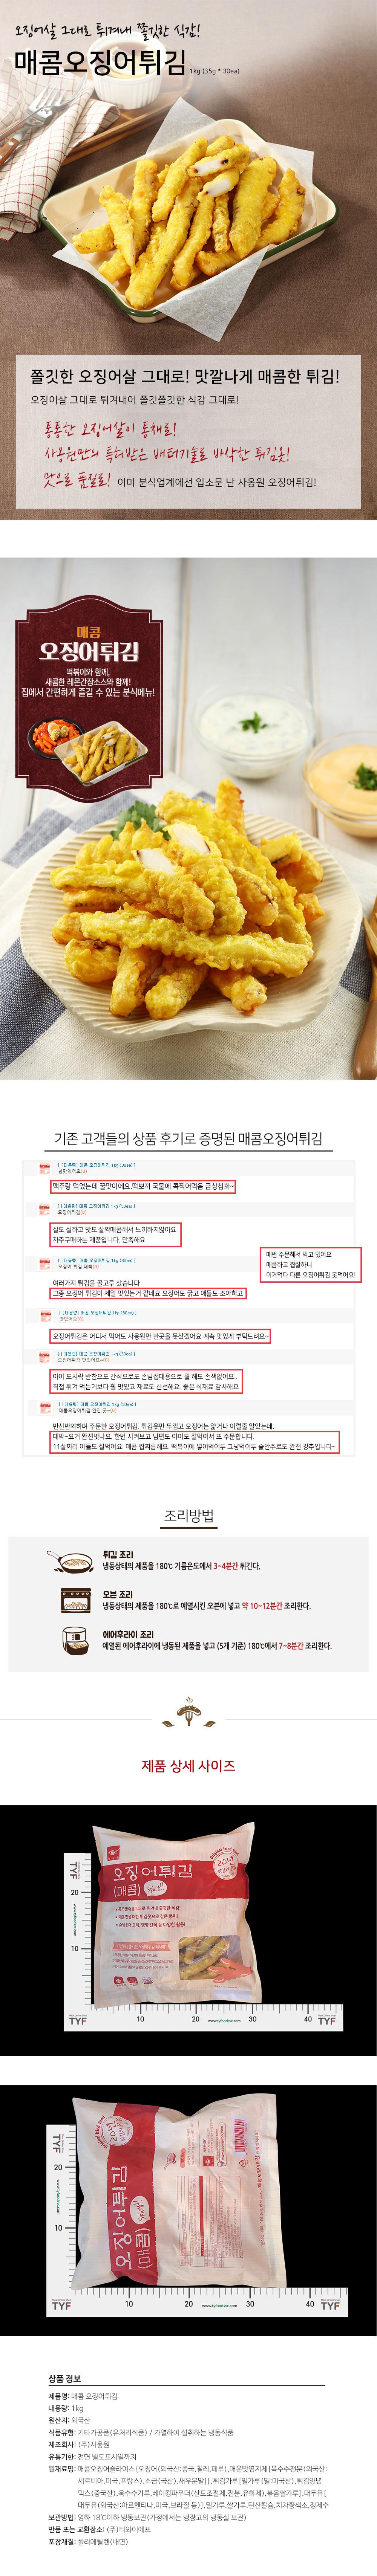 saongwon_friedsquid1kg.jpg